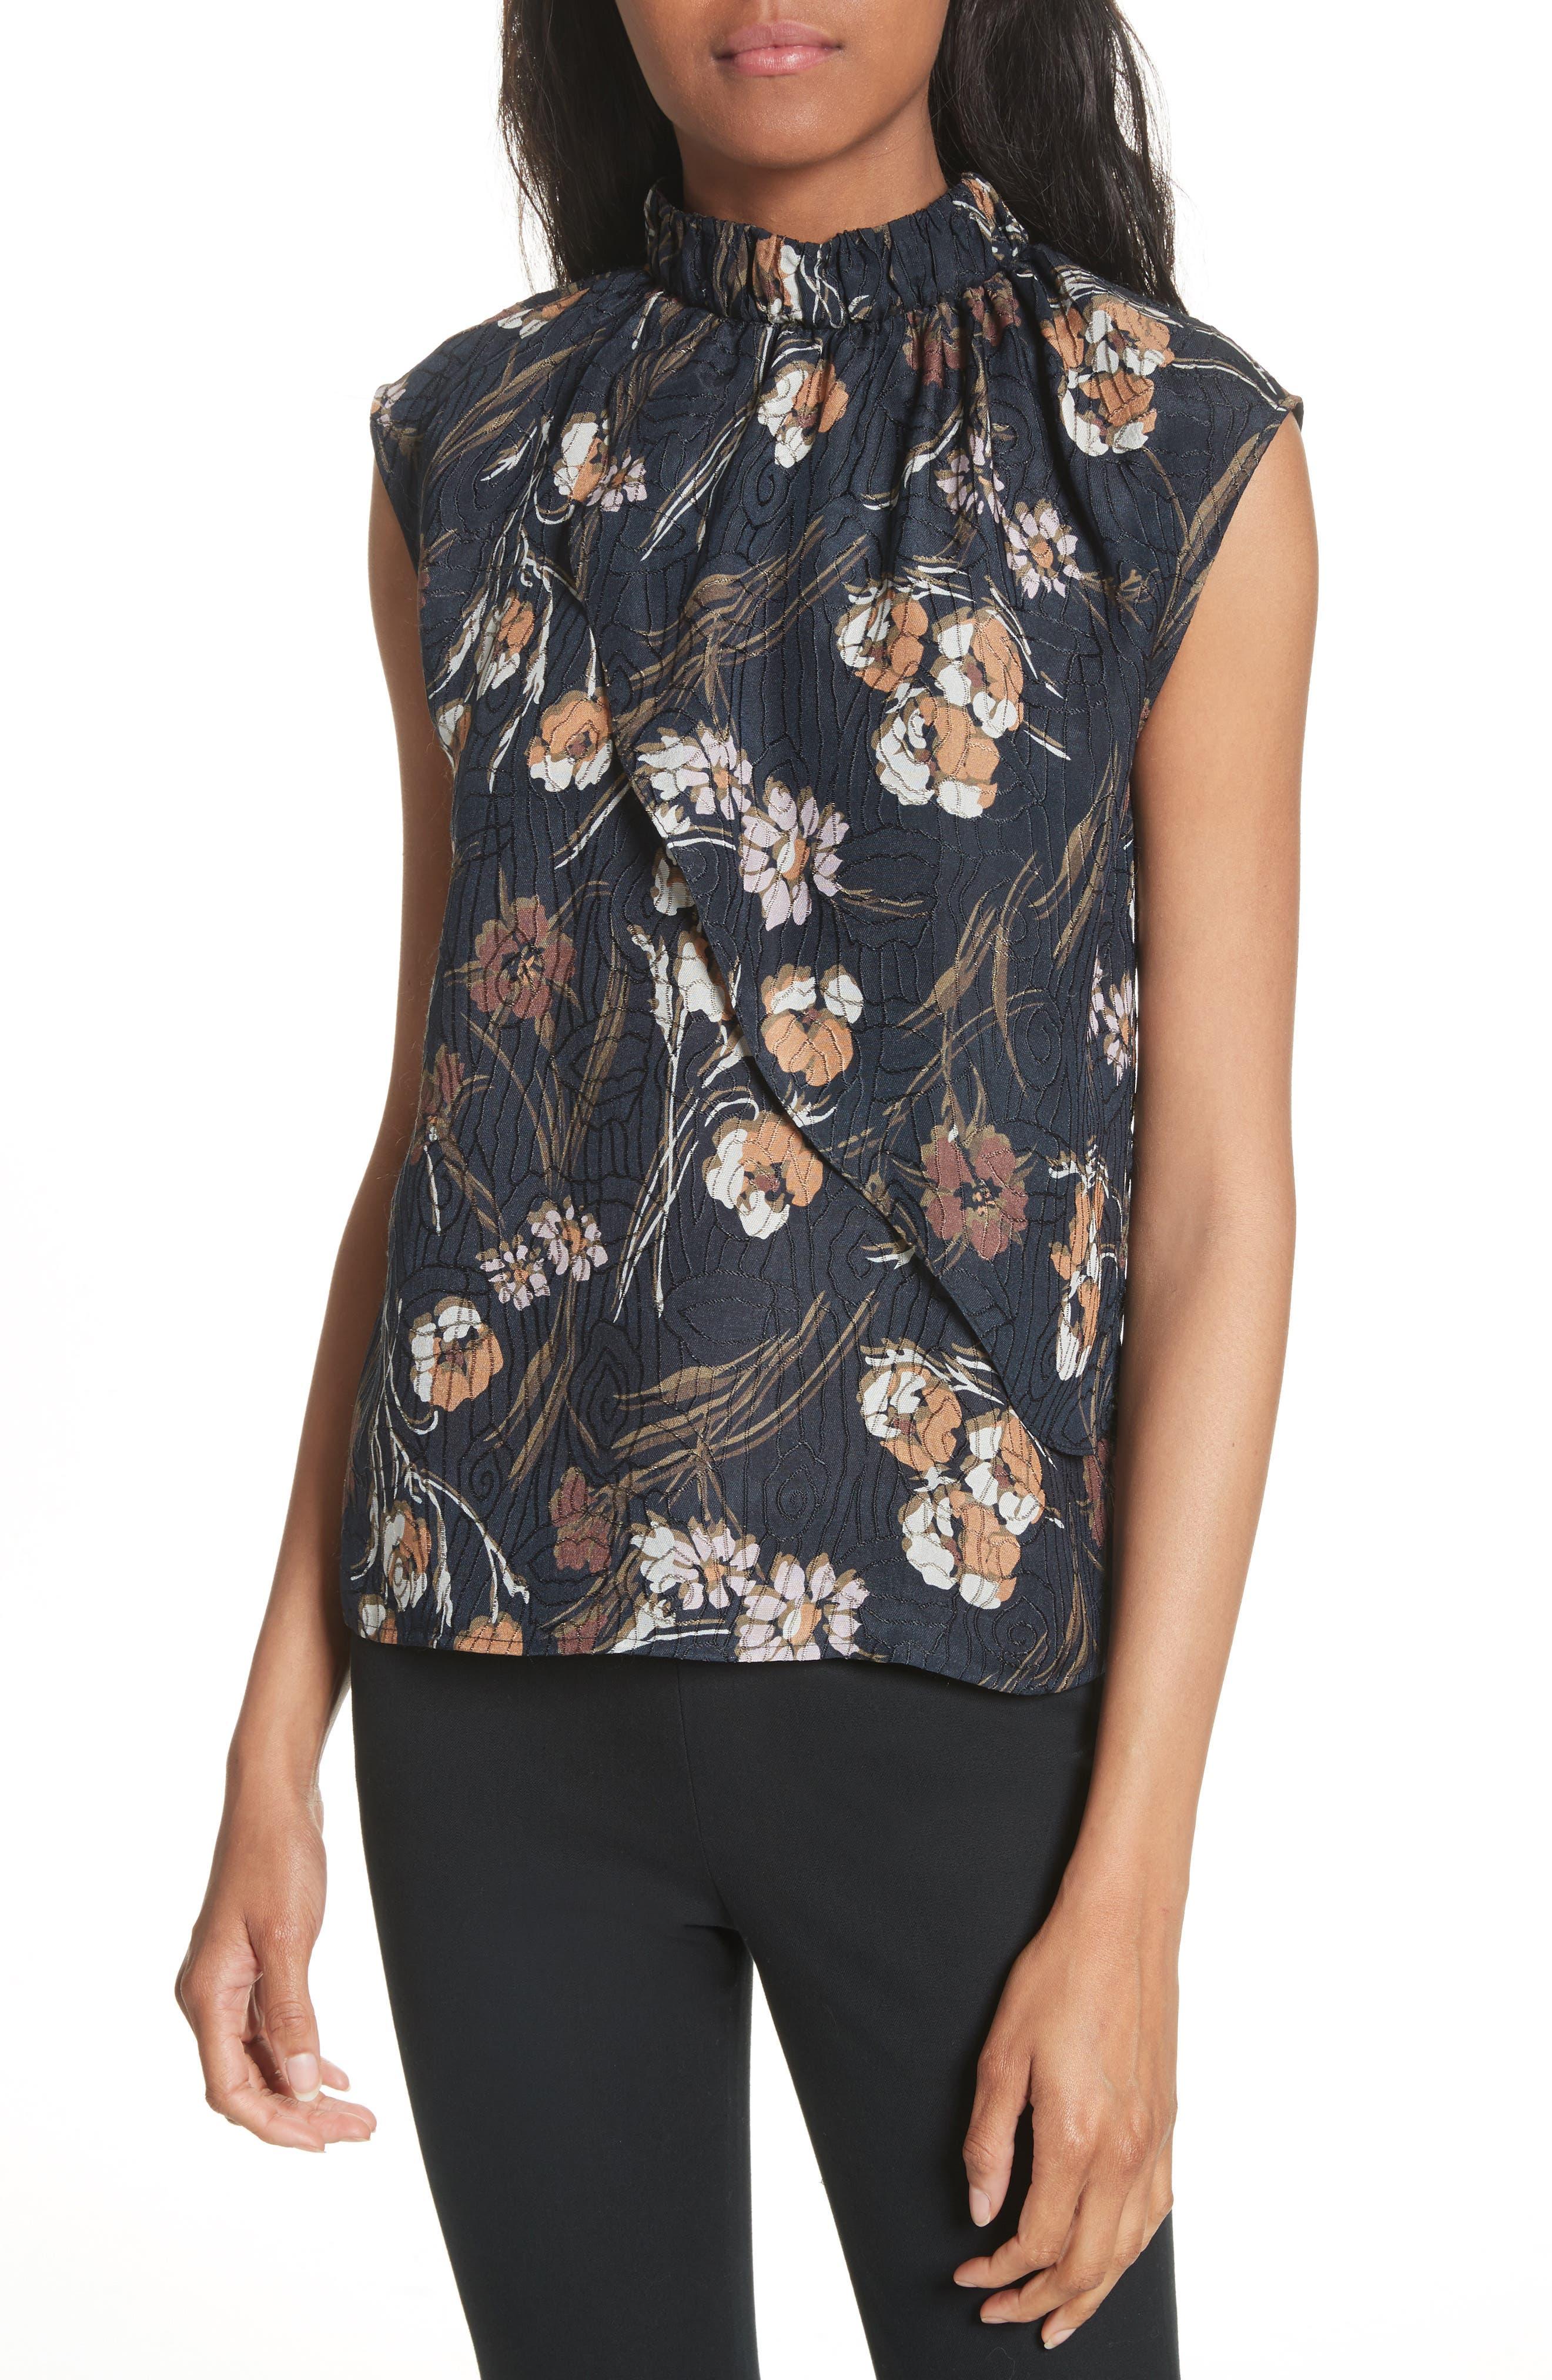 Derek Lam 10 Crosby Floral Silk Blend Blouse